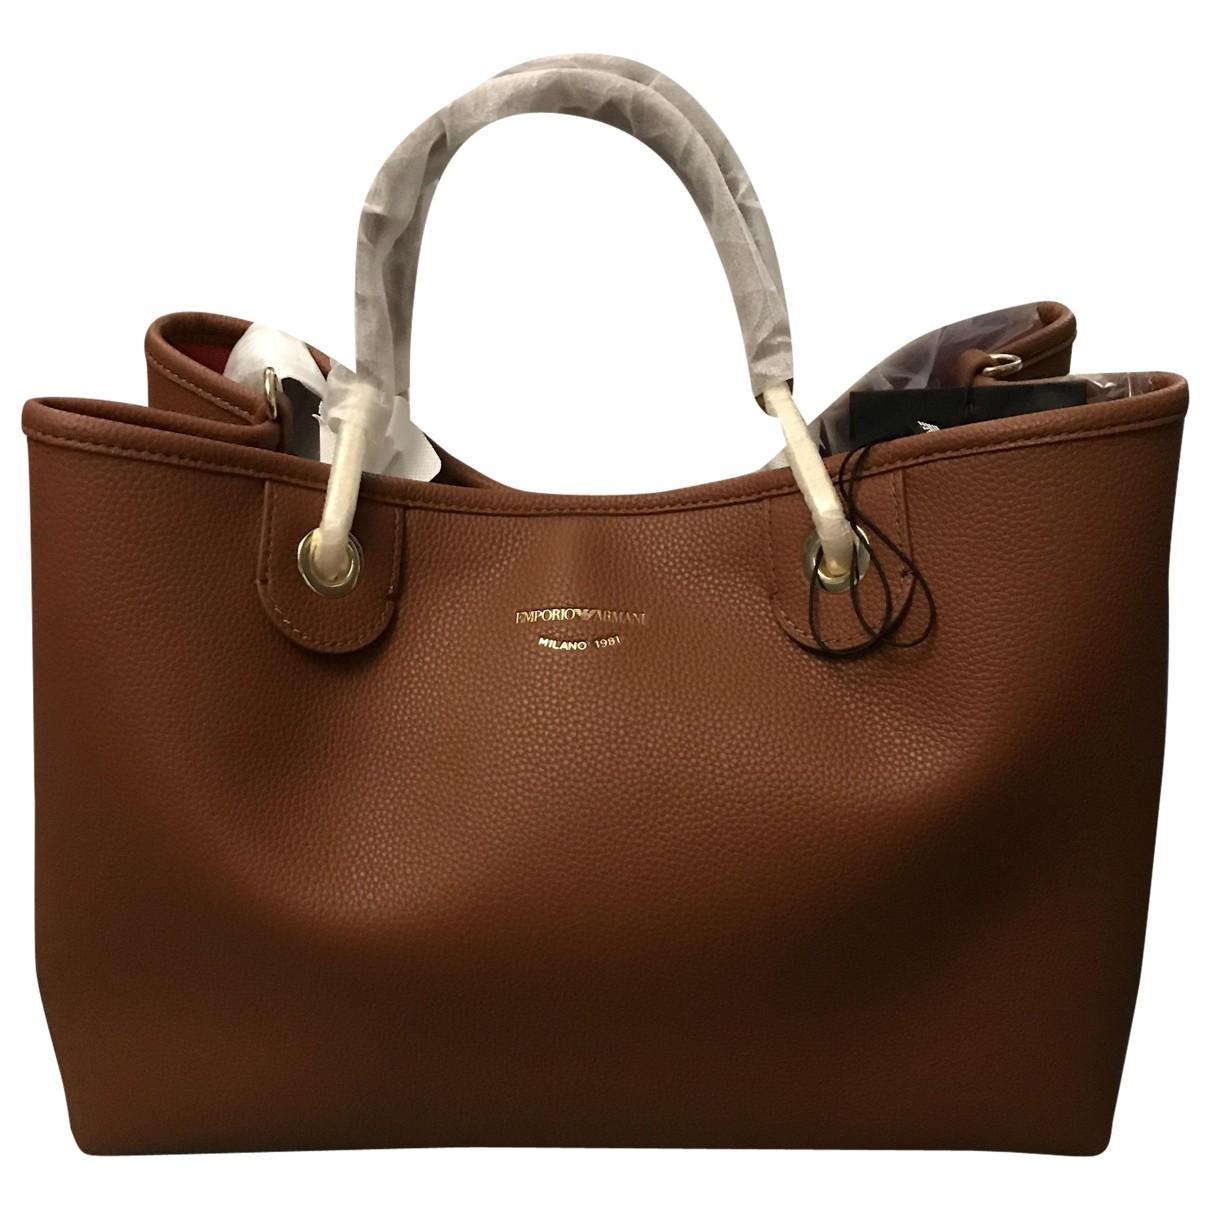 Emporio Armani \N Brown handbag for Women \N